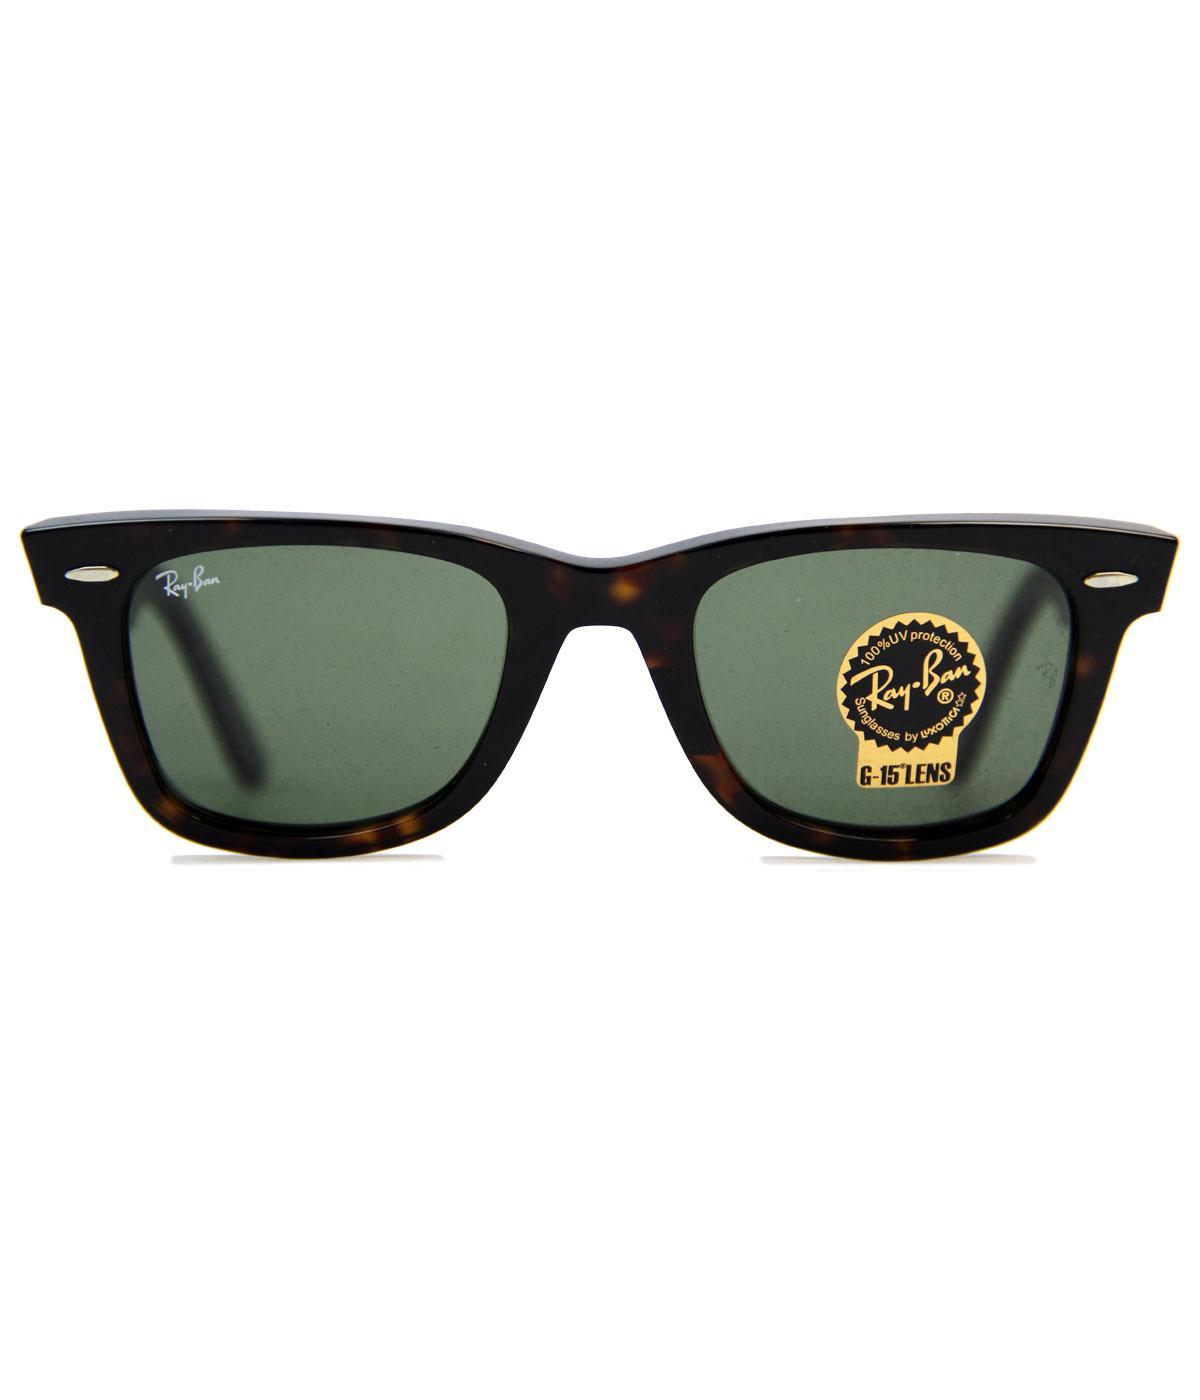 Ray-Ban Retro Mod Wayfarer Indie Sunglasses (Br)